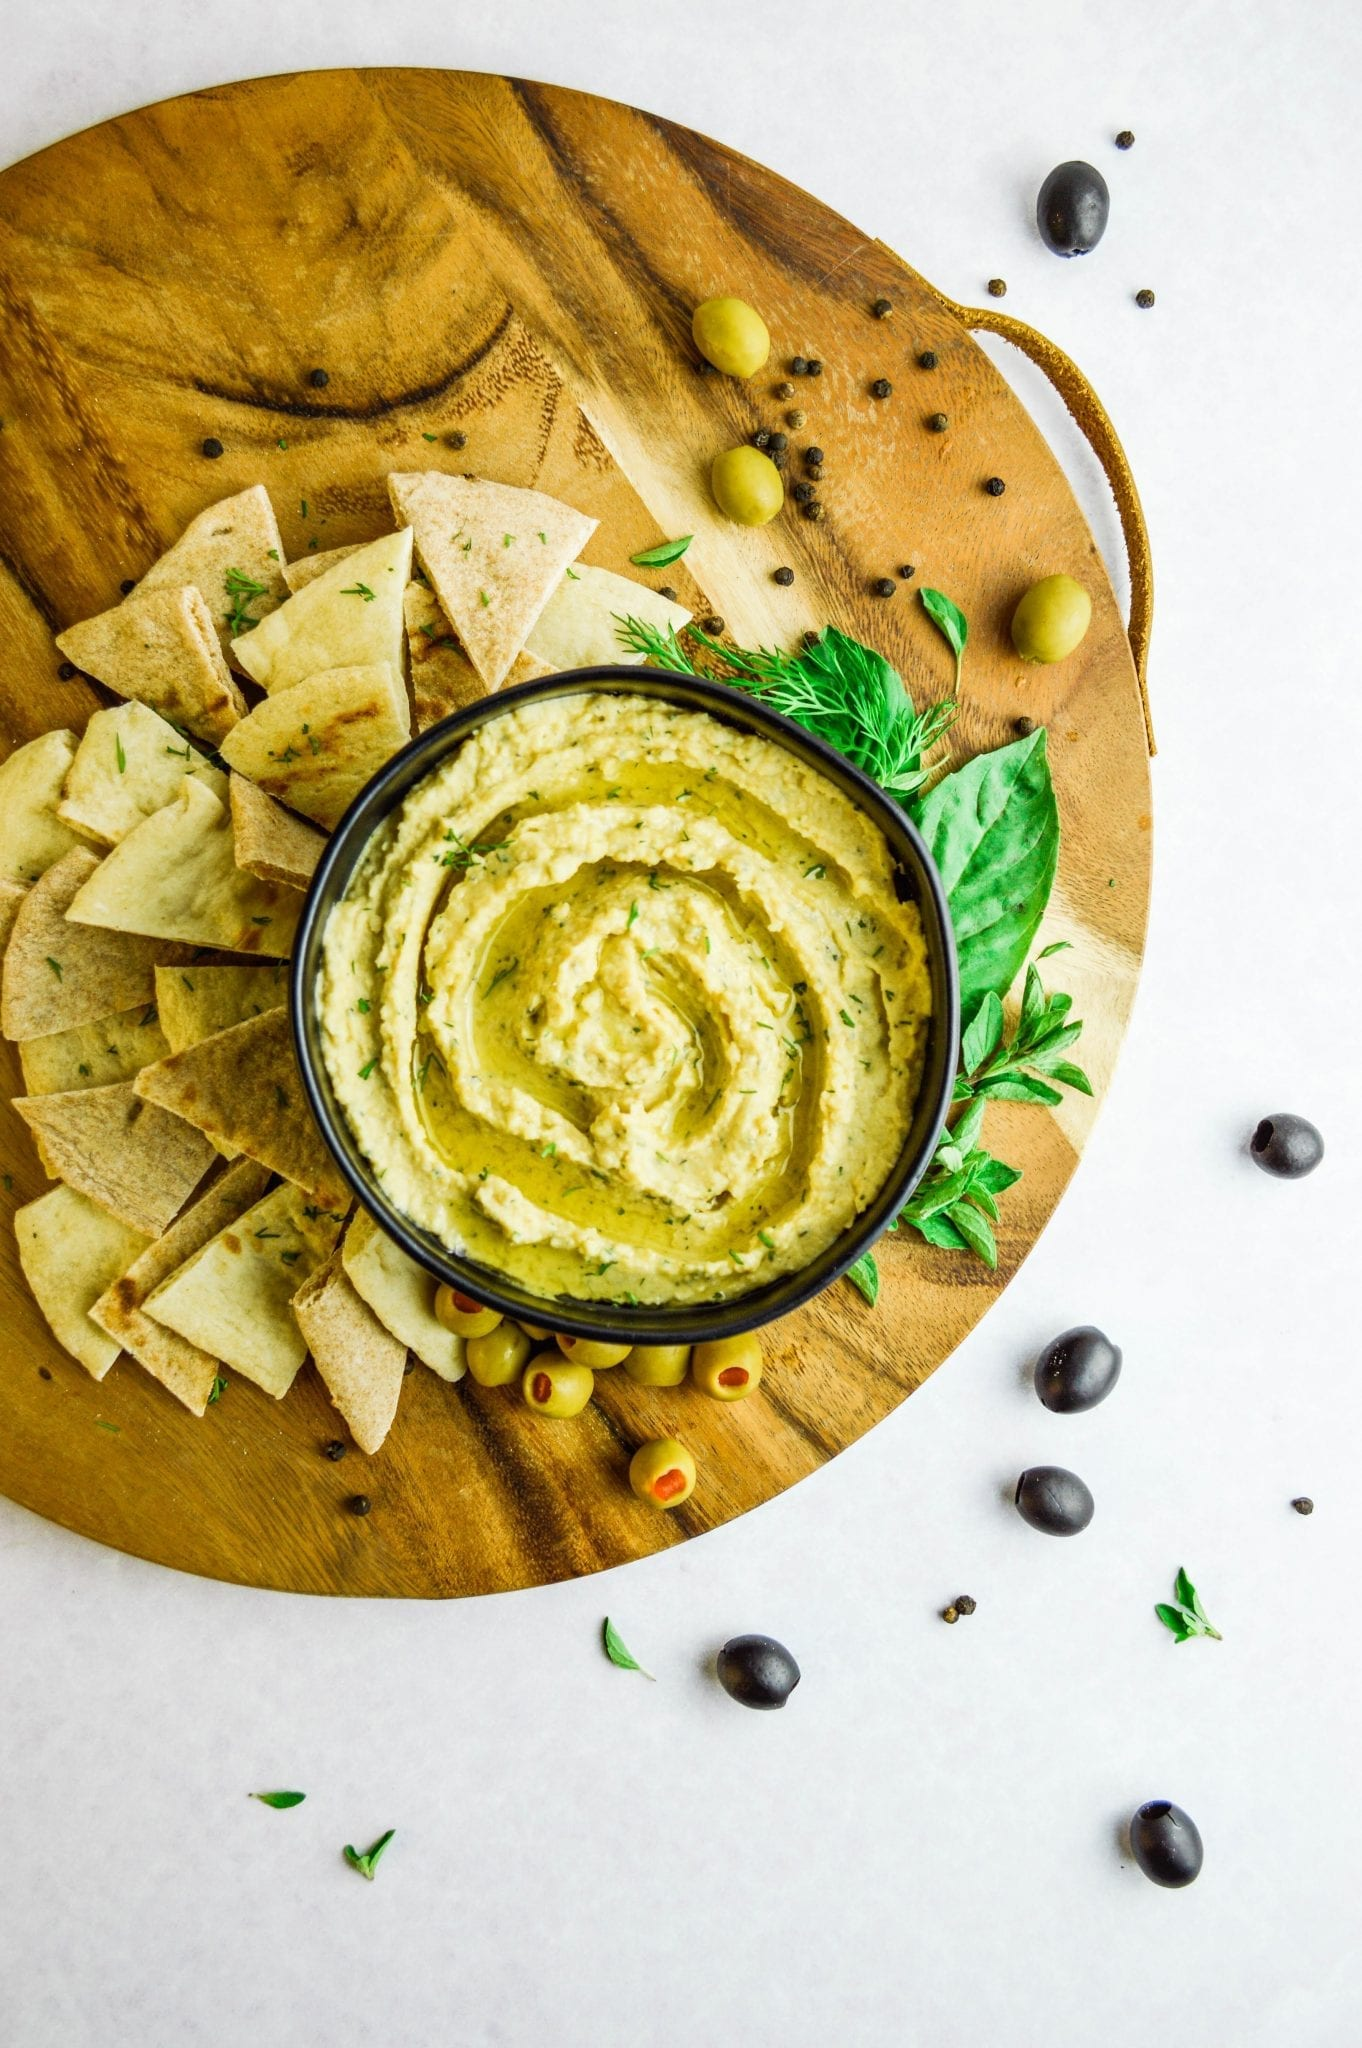 Homemade Mediterranean Hummus | Vegan & Gluten Free